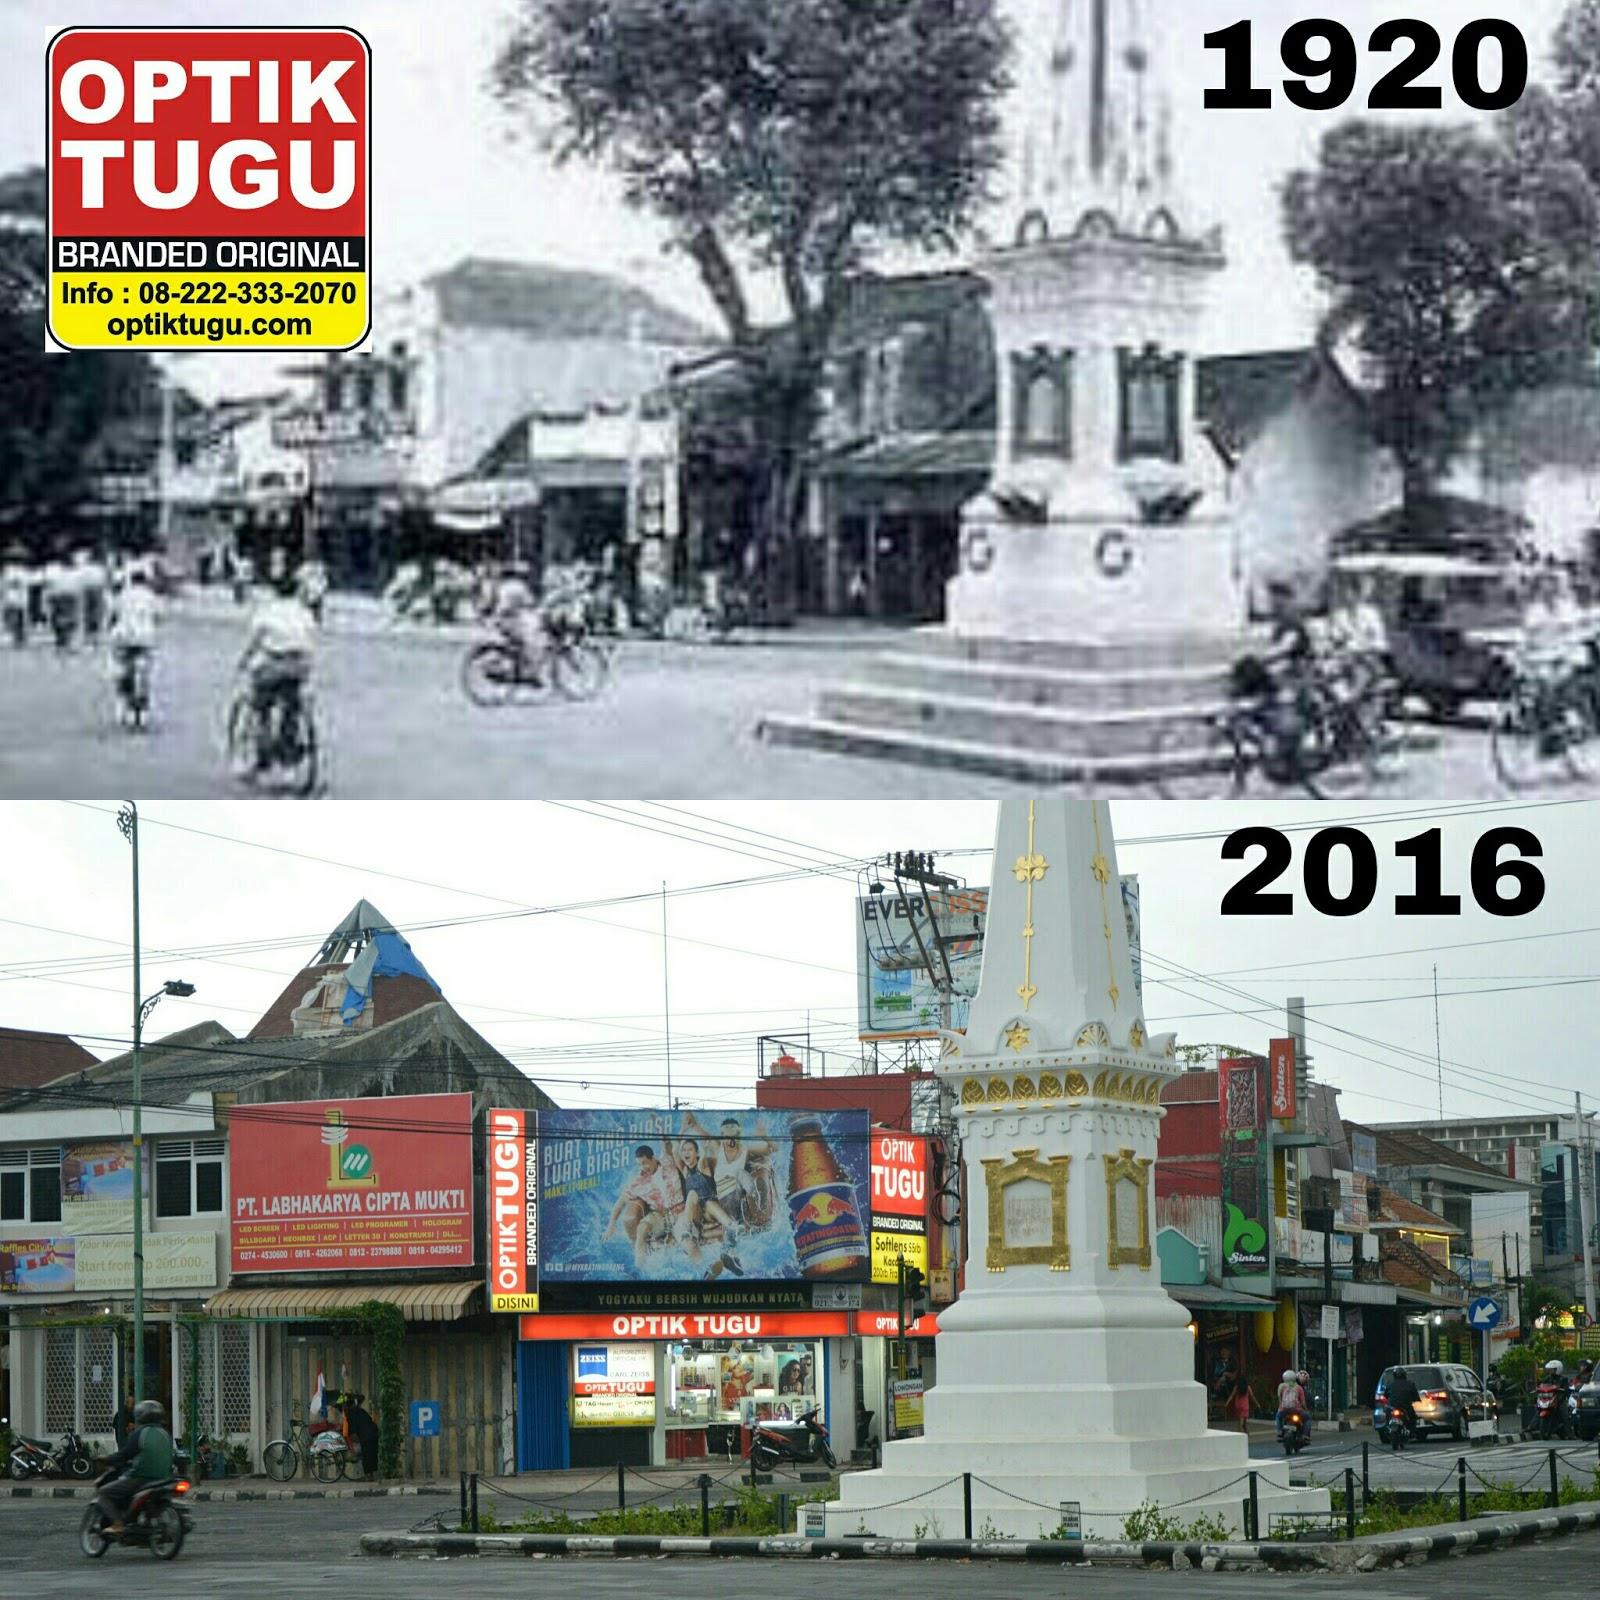 News Optiktugu Optik Tugu Yogyakarta Prapatan Monumen Kota